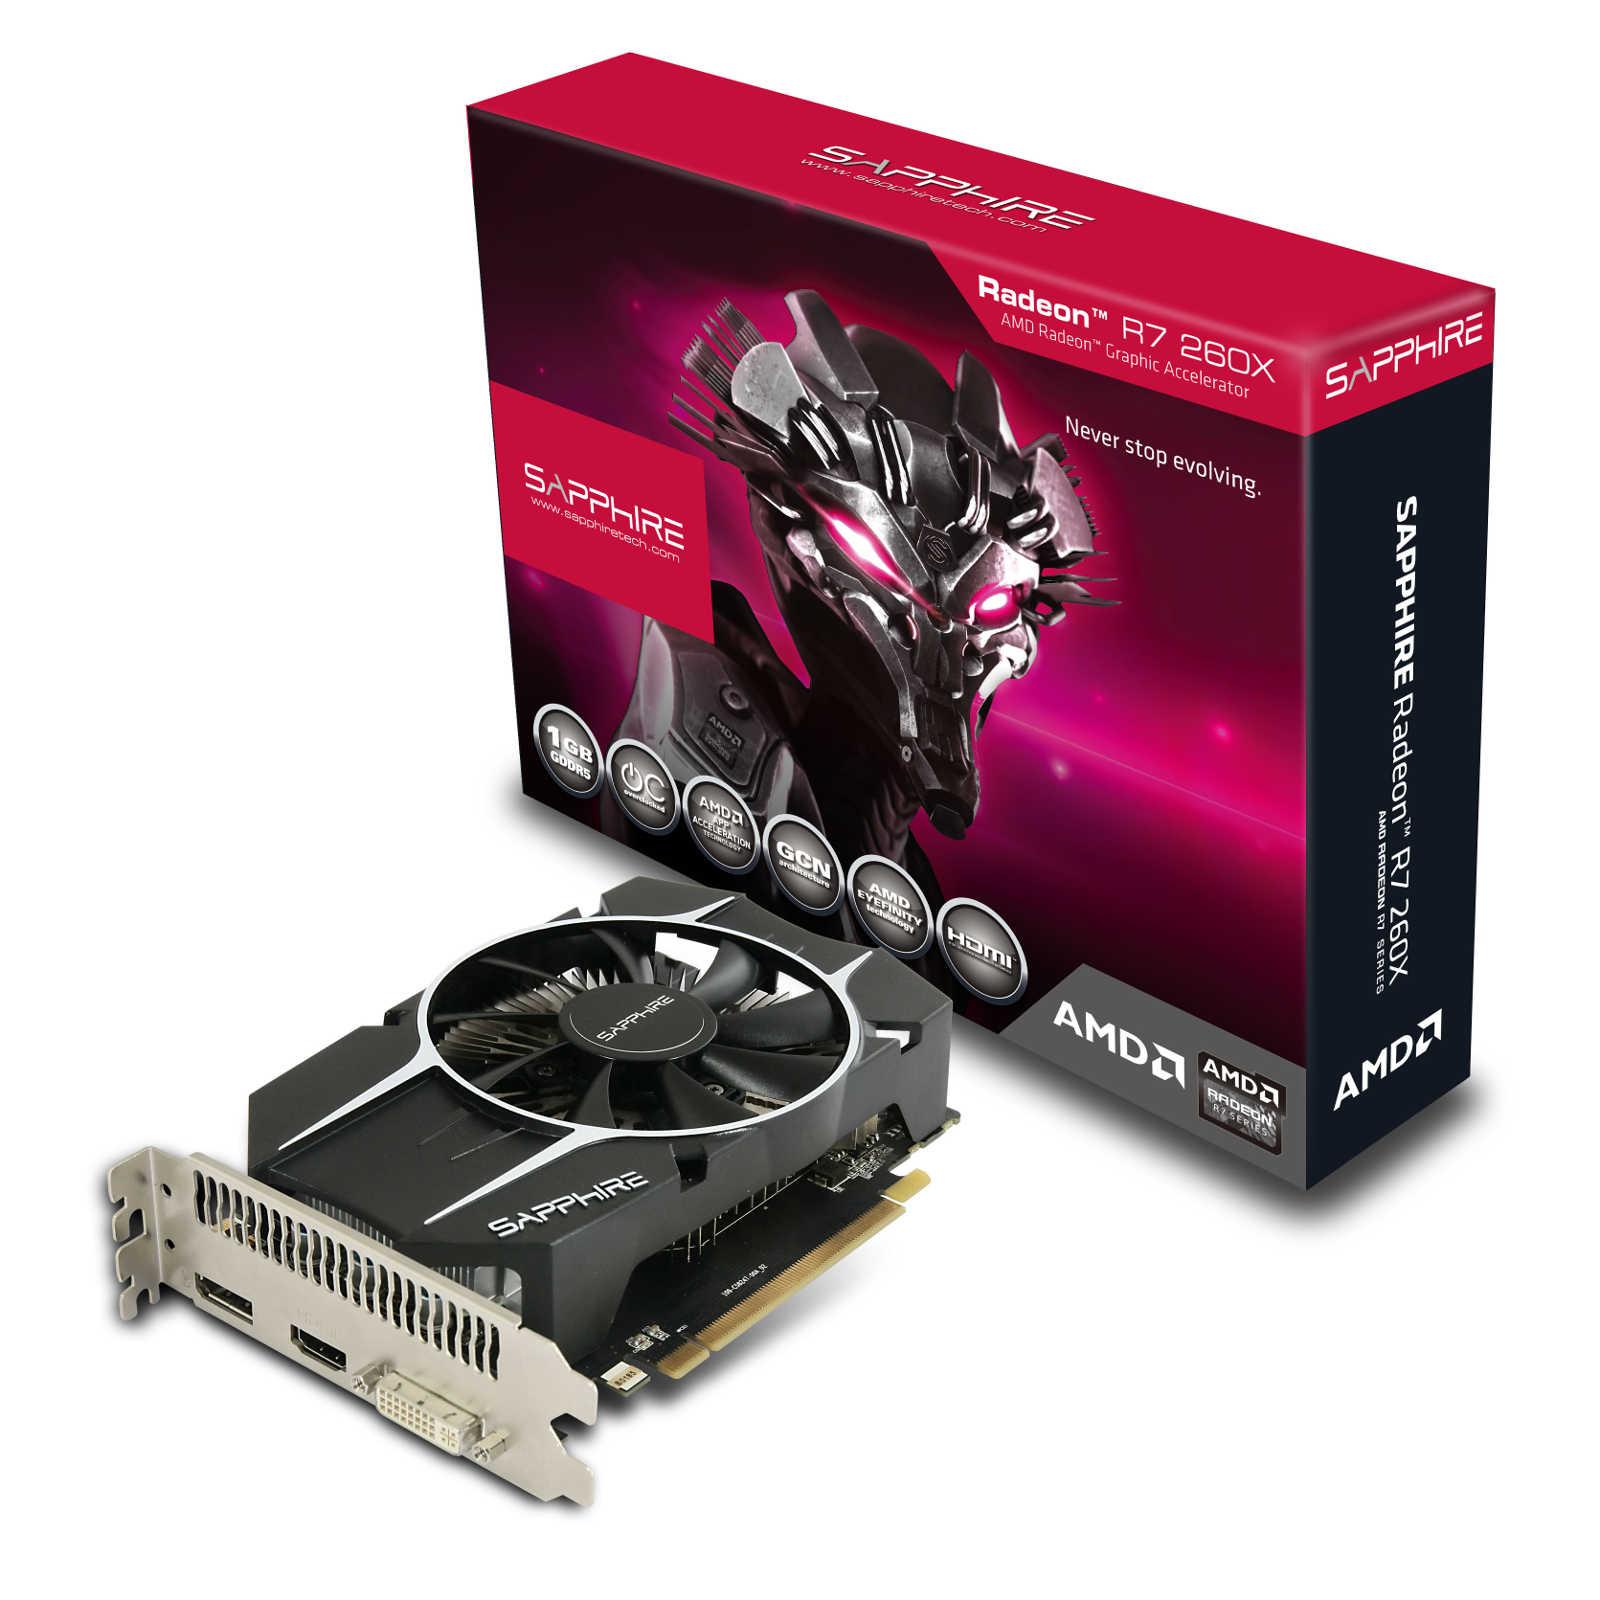 Carte graphique Sapphire Radeon R7 260X 1G GDDR5 OC 1 Go DVI/HDMI/DisplayPort - PCI Express (AMD Radeon R7 260X)